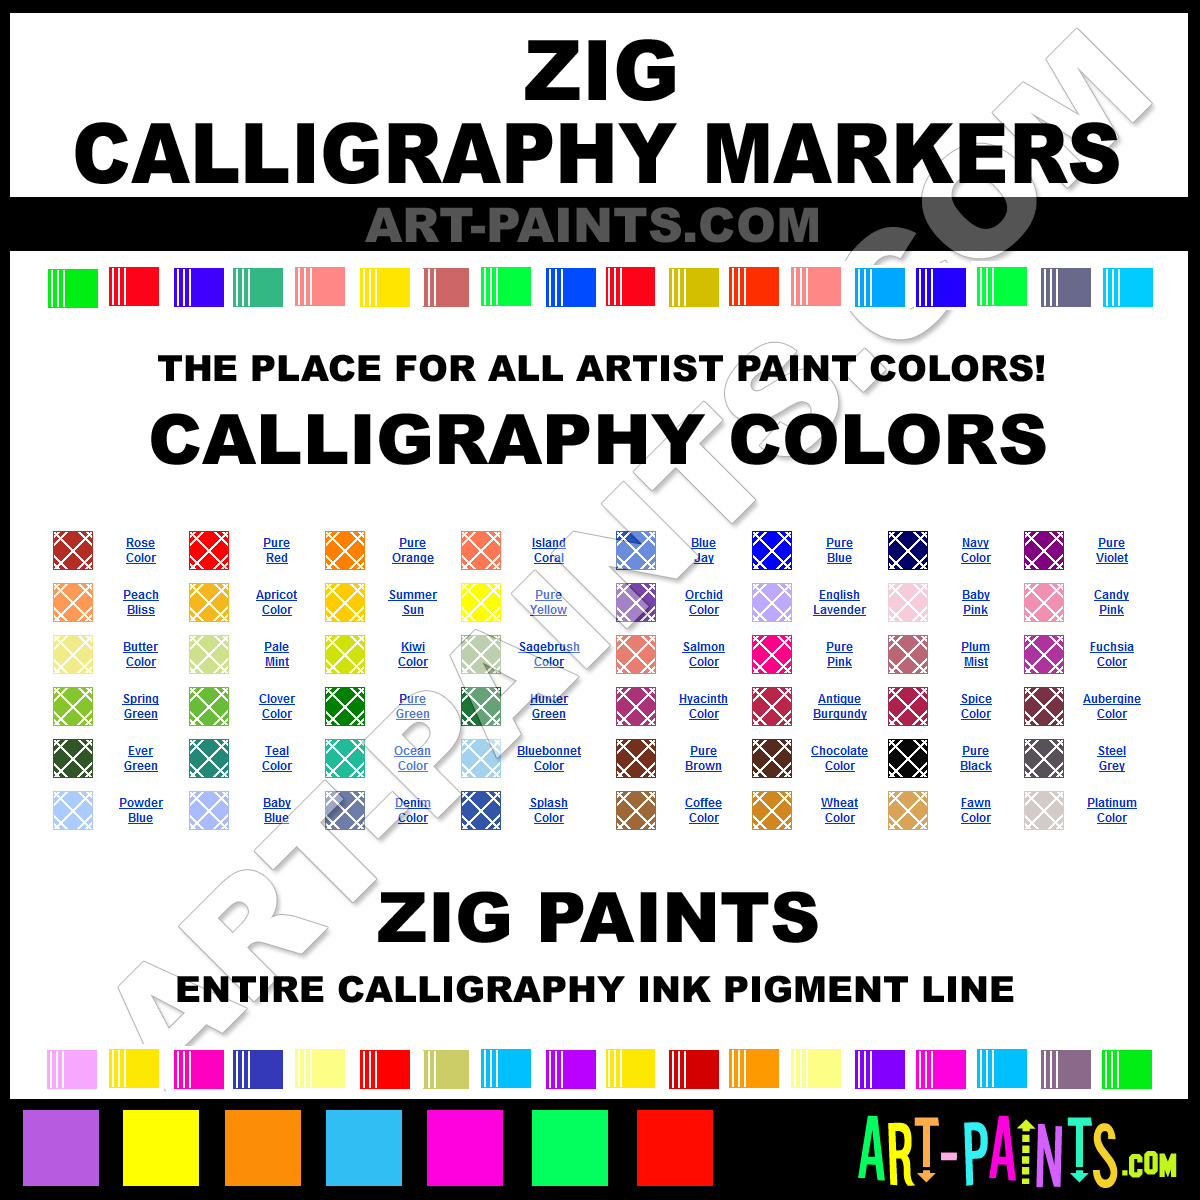 Zig Calligraphy Ink Pigments And Paint Brands Zig Paint